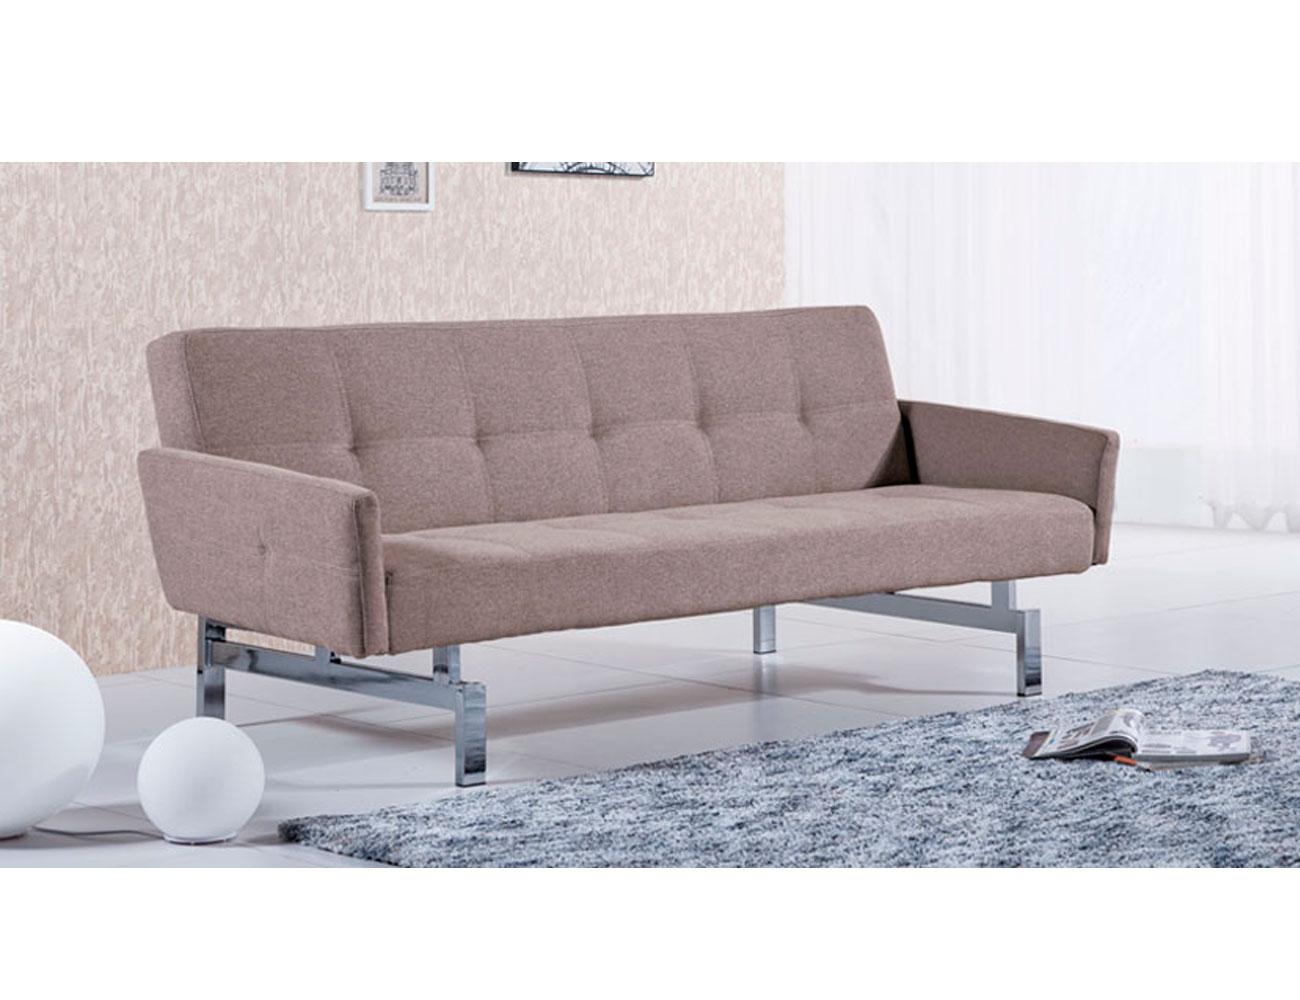 Sofa cama con brazos elegance moka